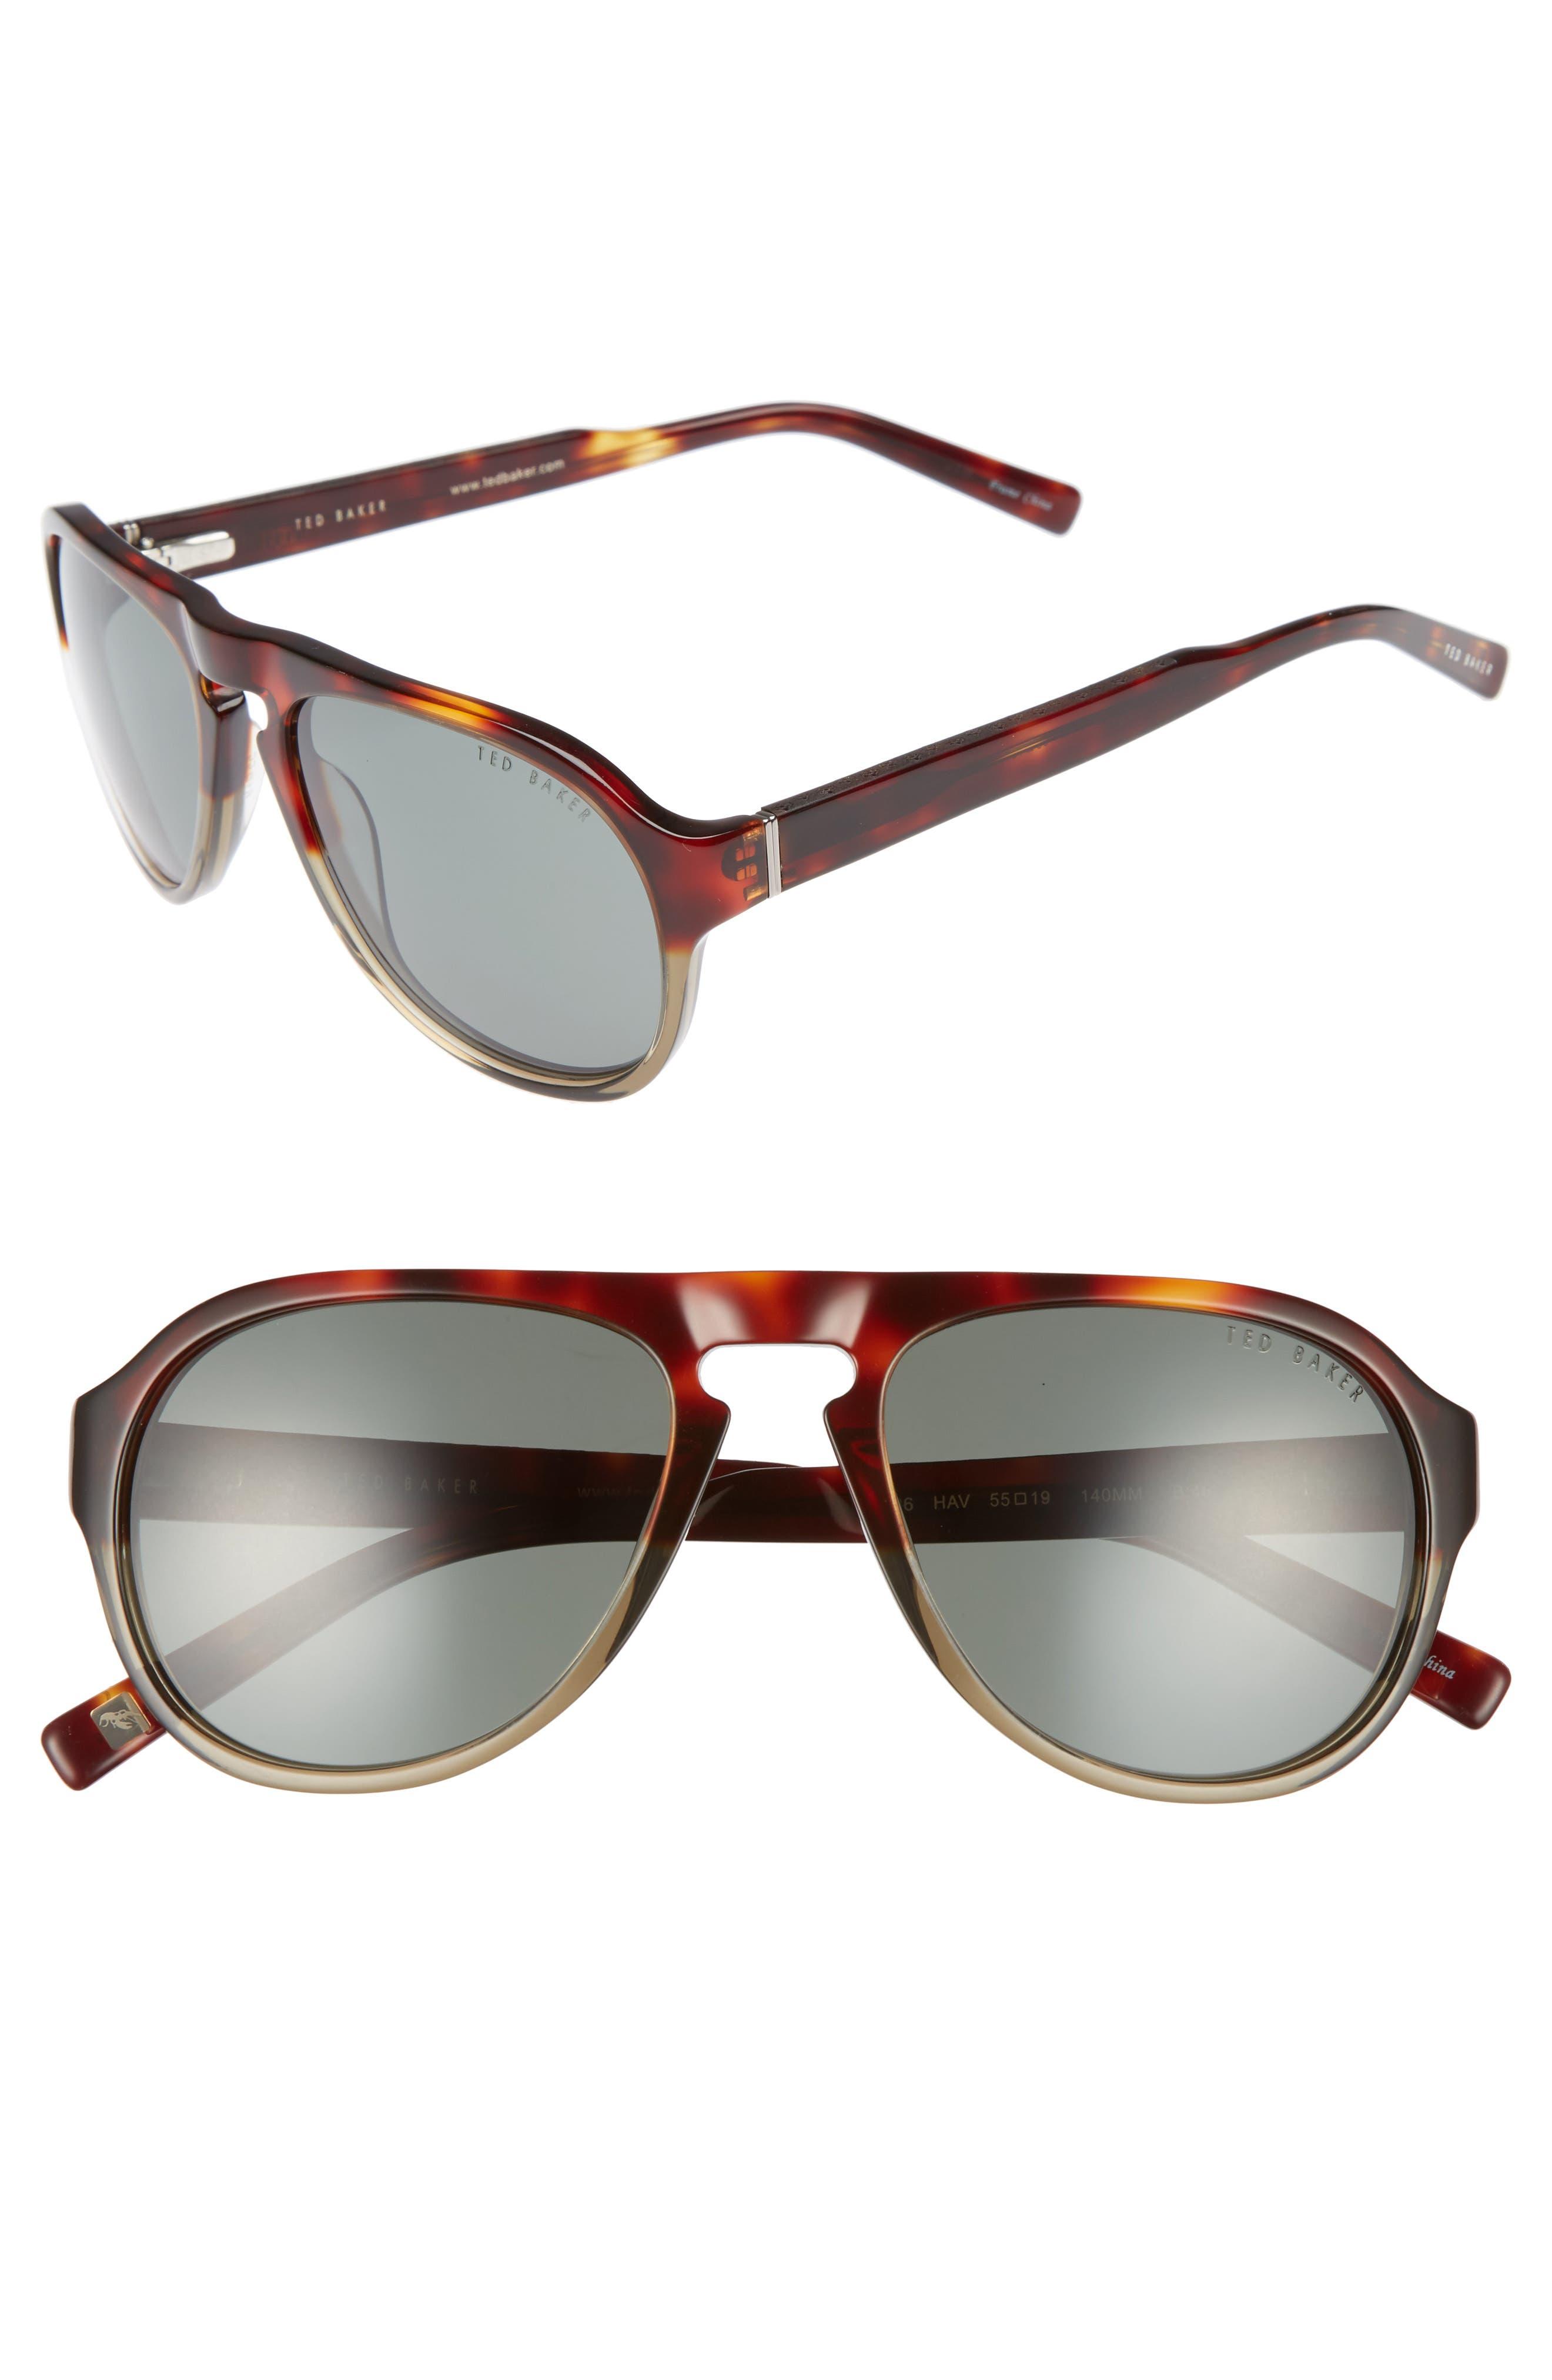 55mm Polarized Aviator Sunglasses,                         Main,                         color, 241